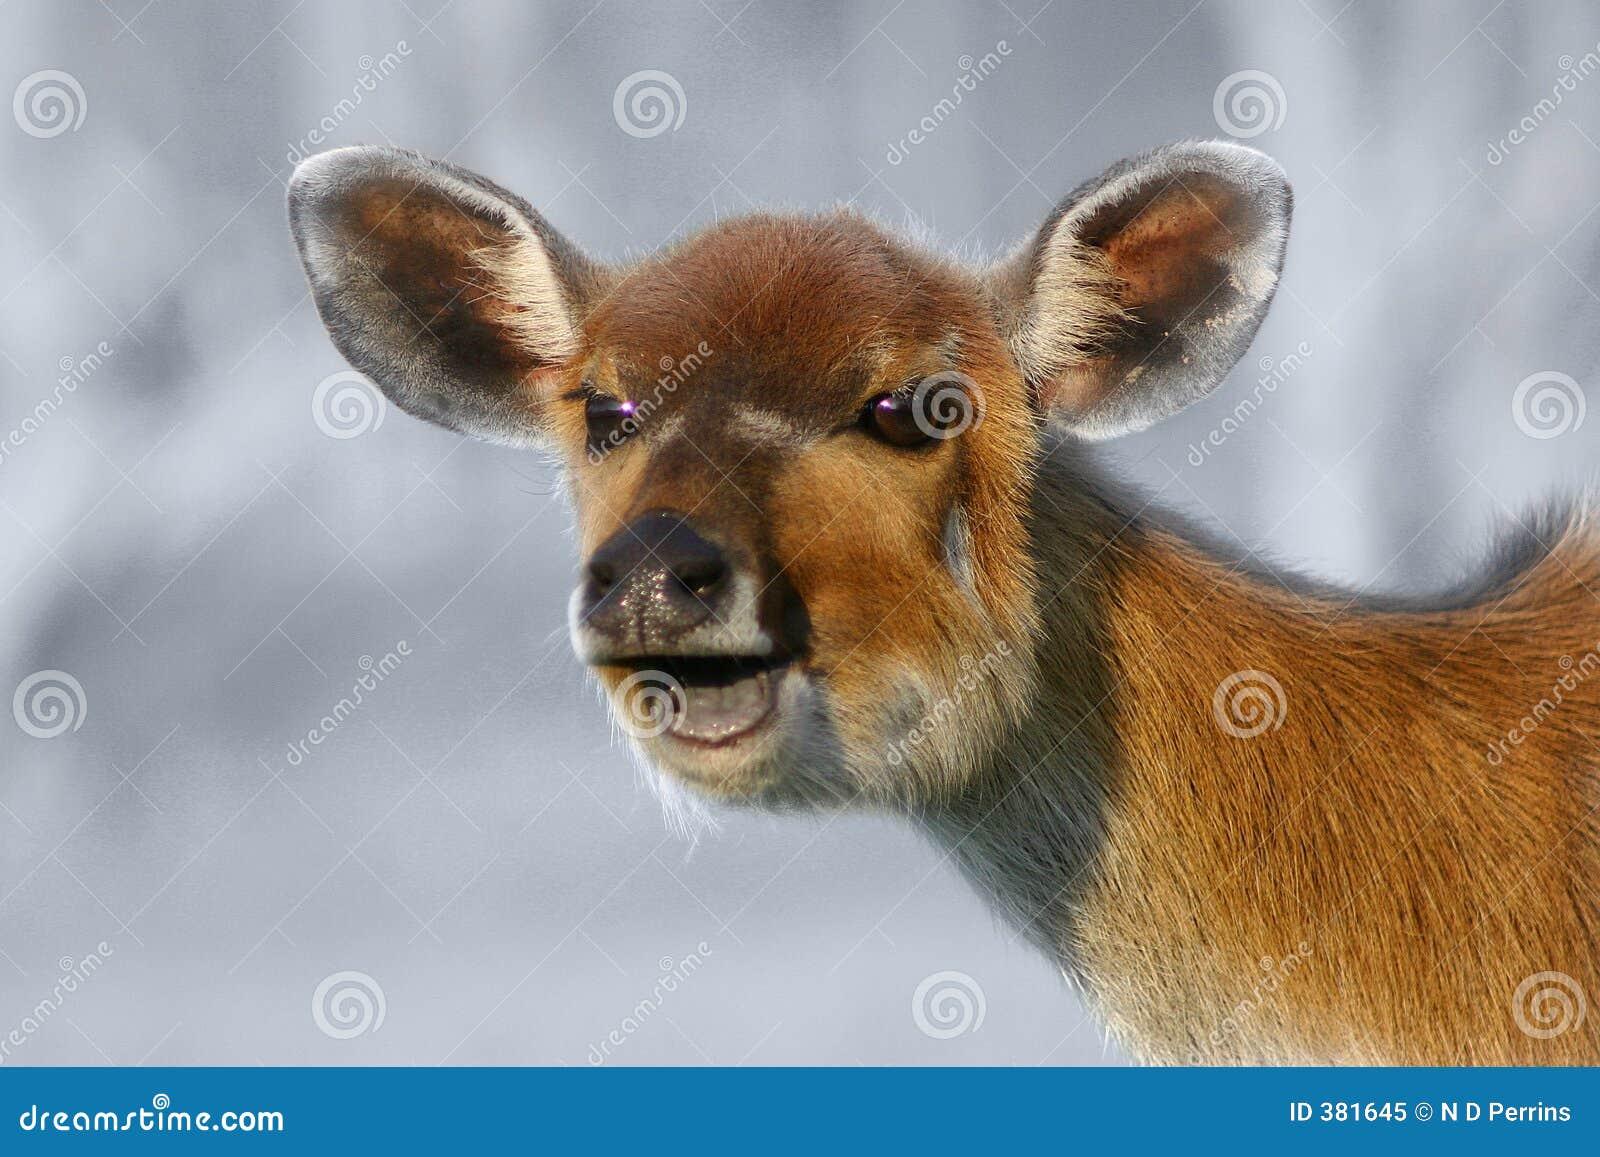 Laughing Deer Royalty Free Stock Photo - Image: 381645 - photo#30